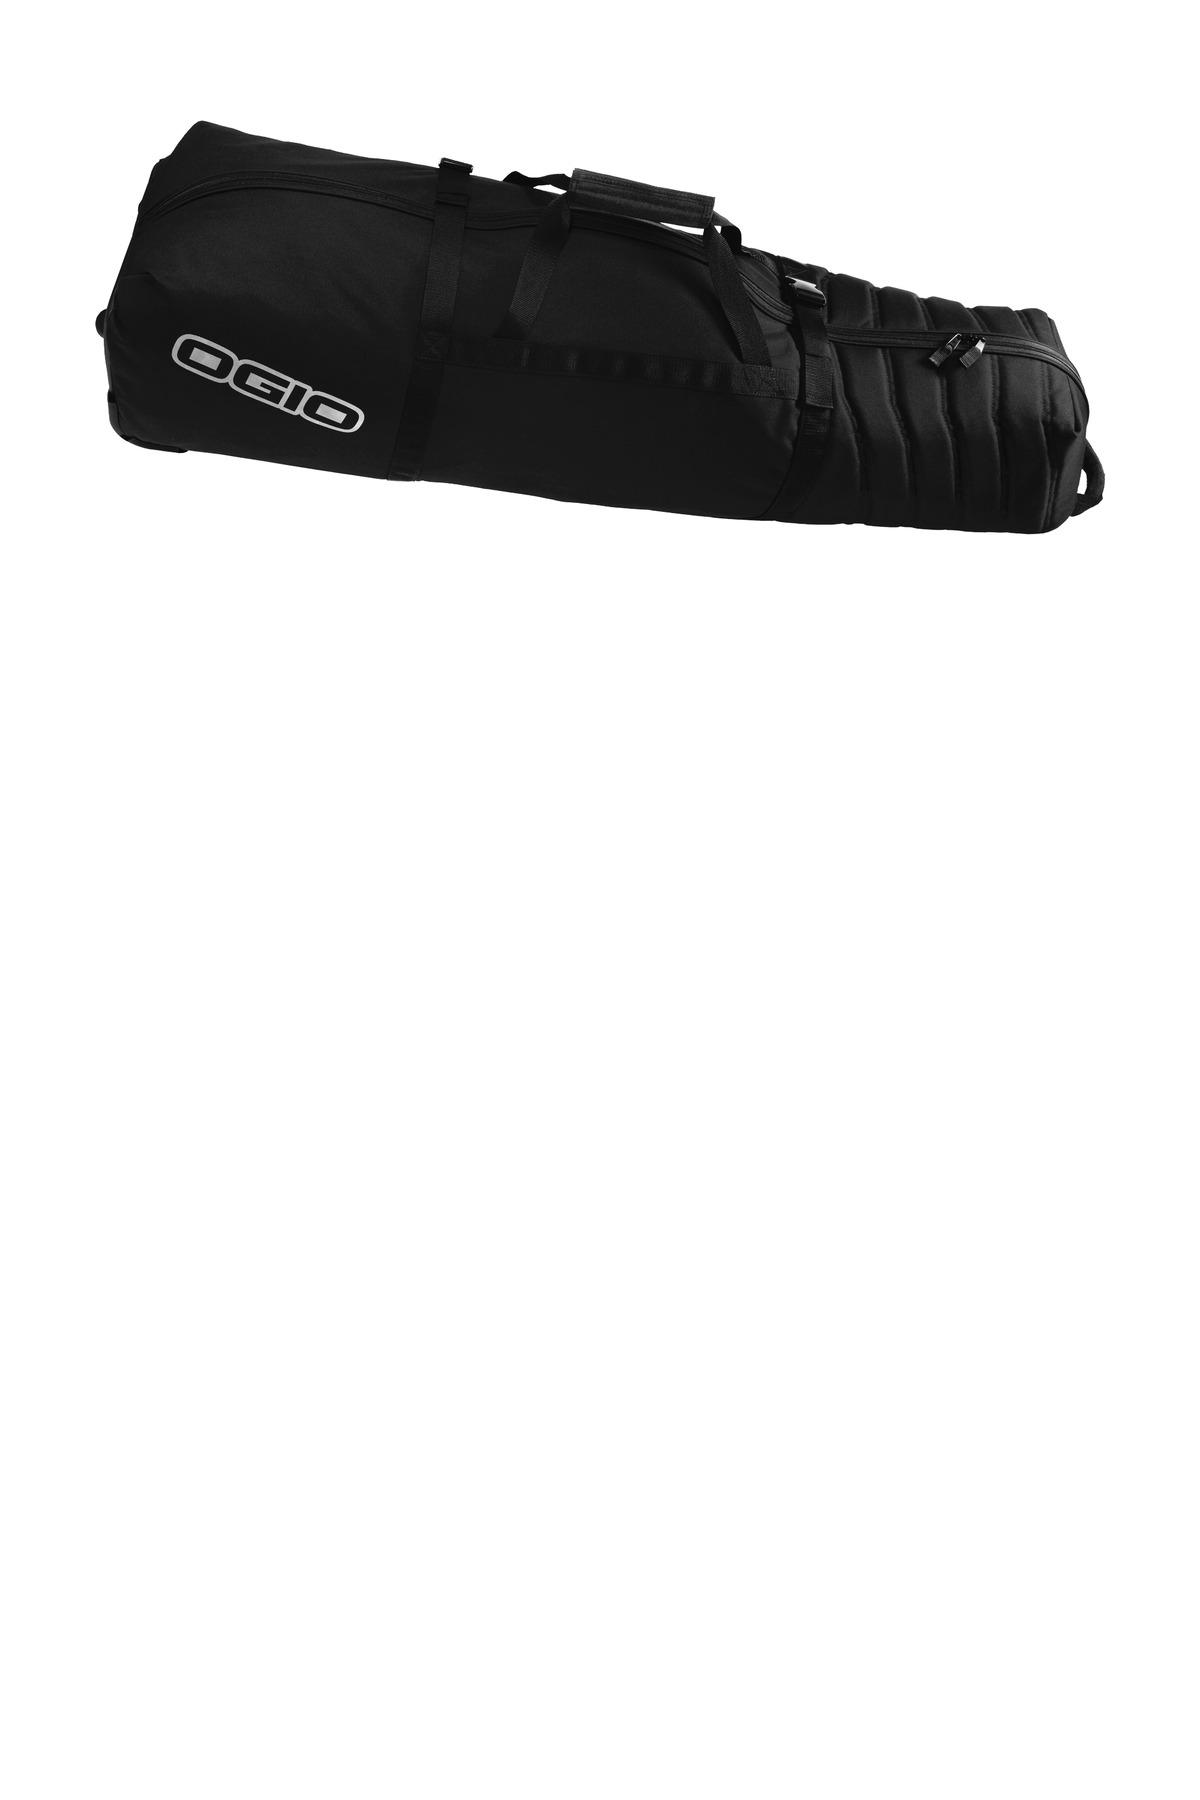 Buy OGIO® Destination Golf Travel Bag. - OGIO Online at Best price - PA e521989020